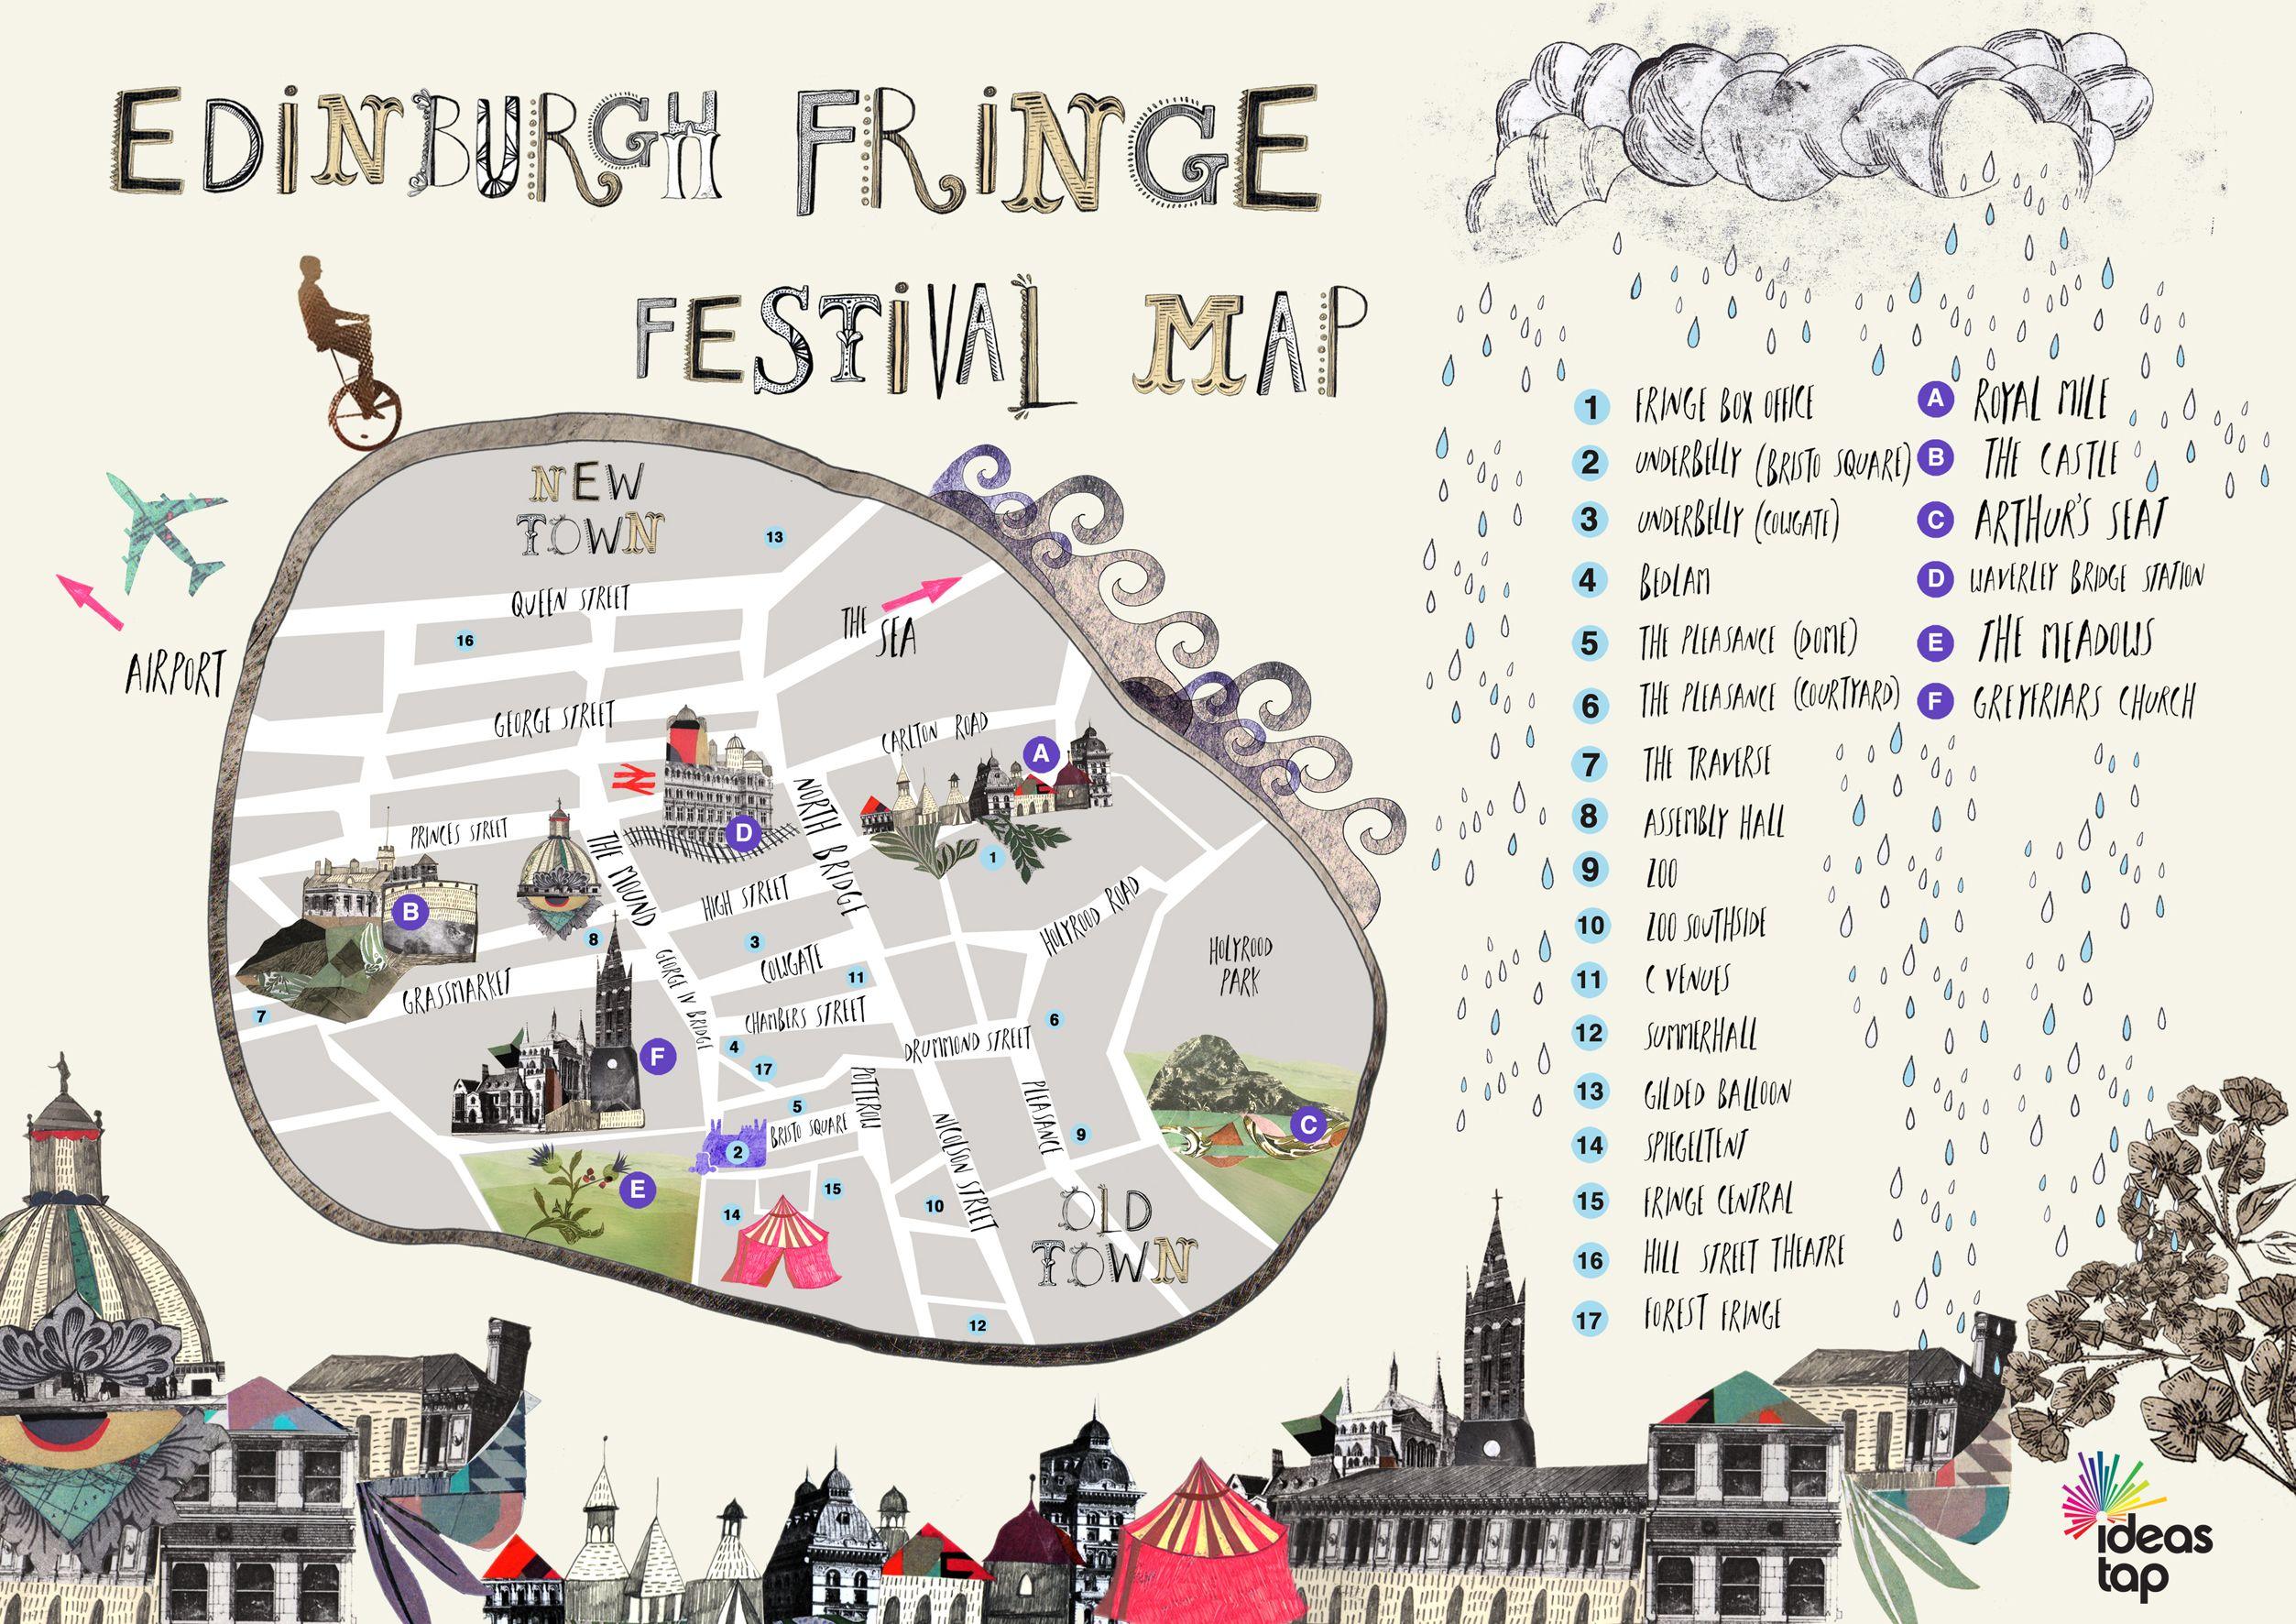 Edinburgh Fringe Map Edinburgh Fringe Fest Map   LSU in the UK & Ireland in 2019   Map